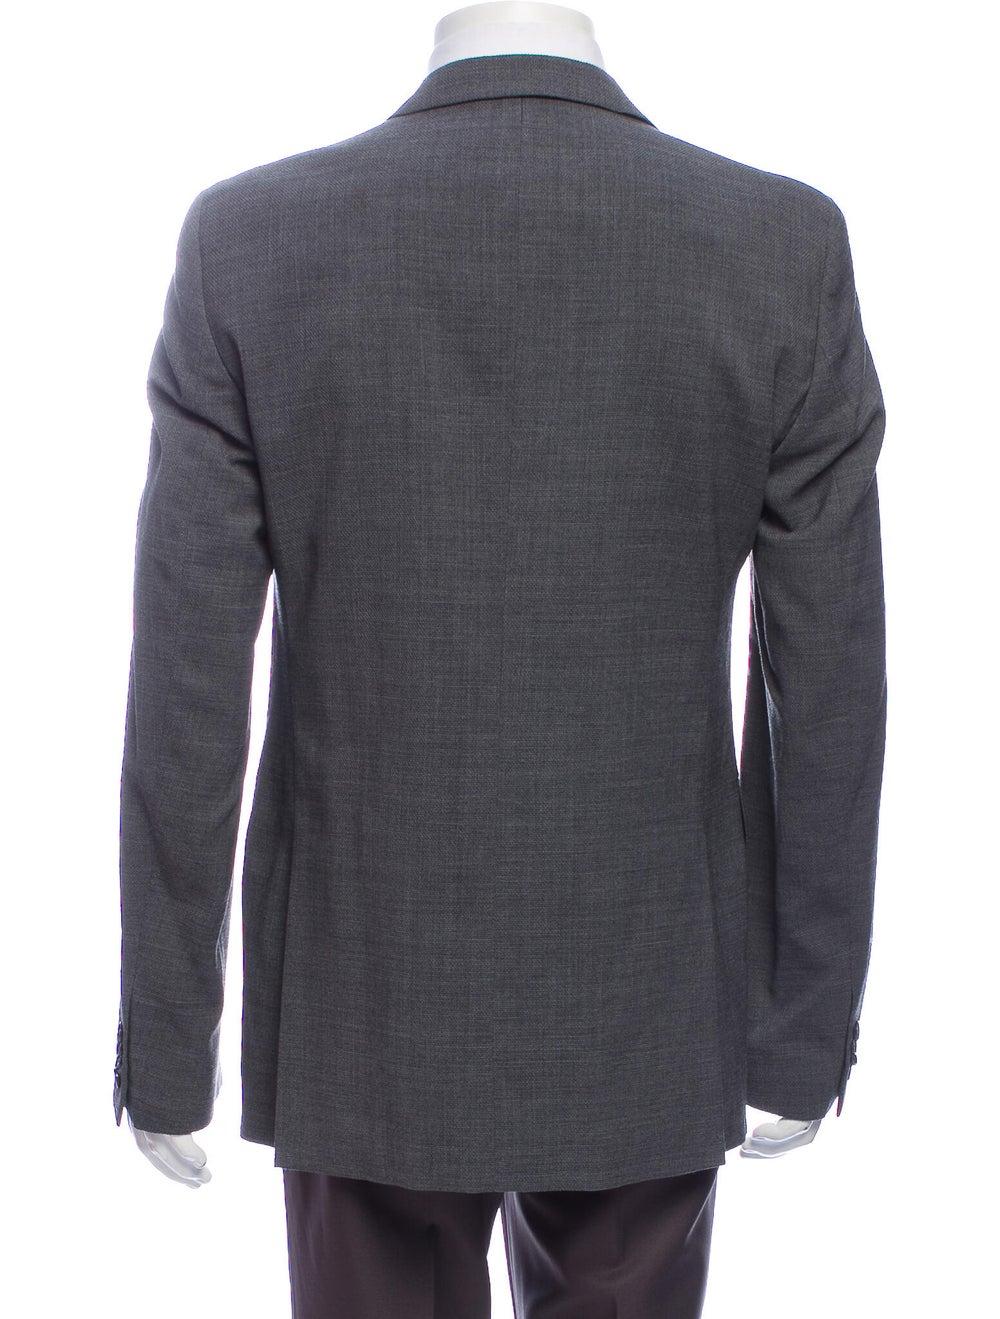 Acne Studios Blazer Grey - image 3